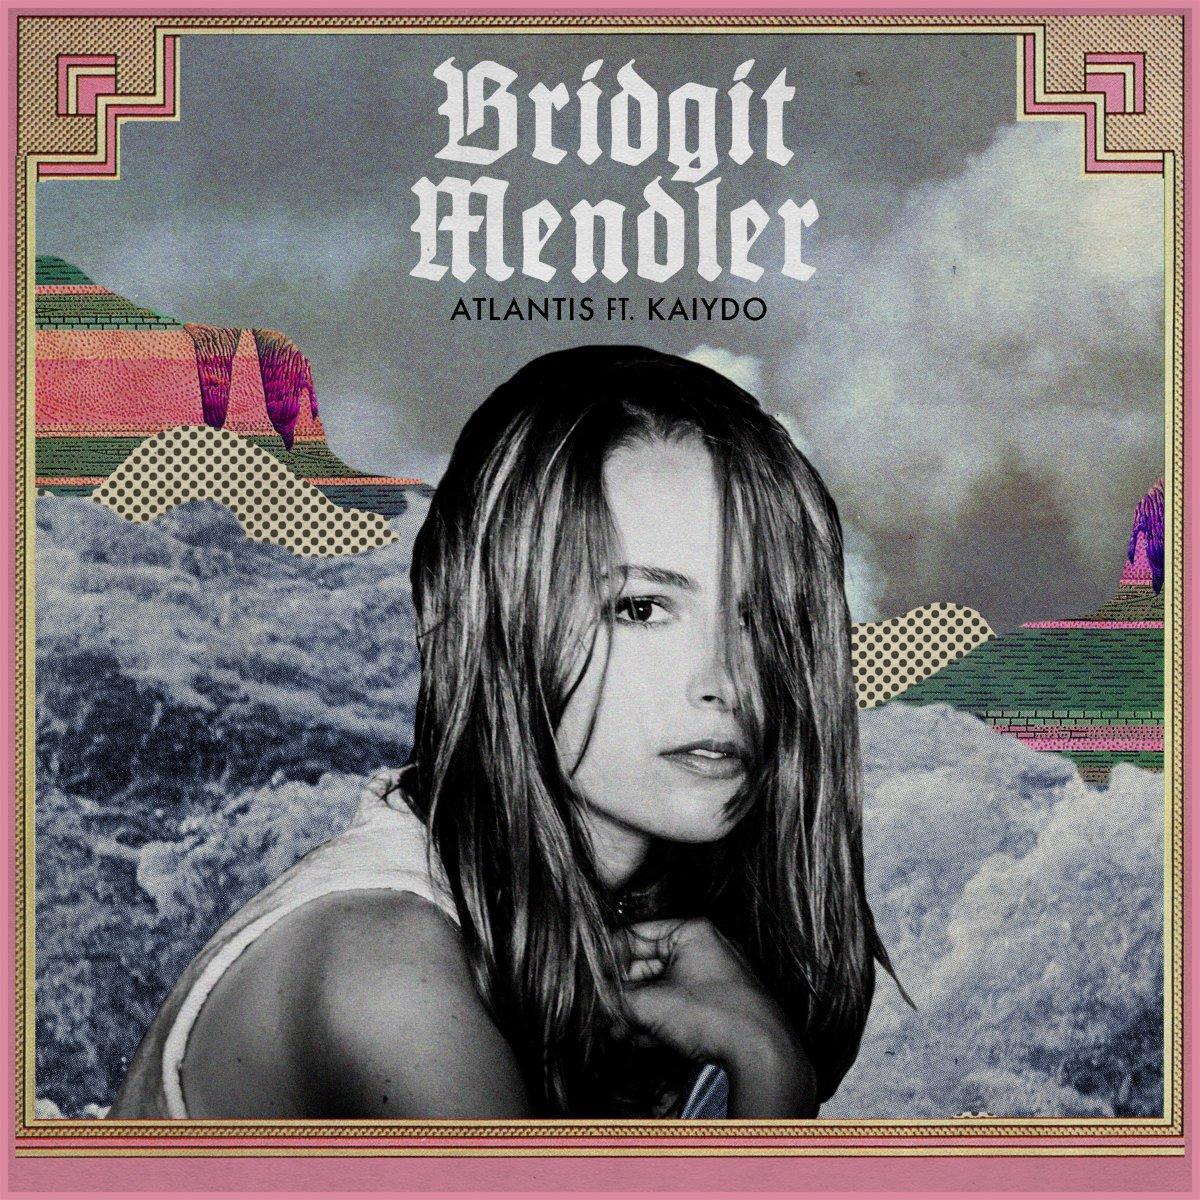 「atlantis bridgit mendler」的圖片搜尋結果